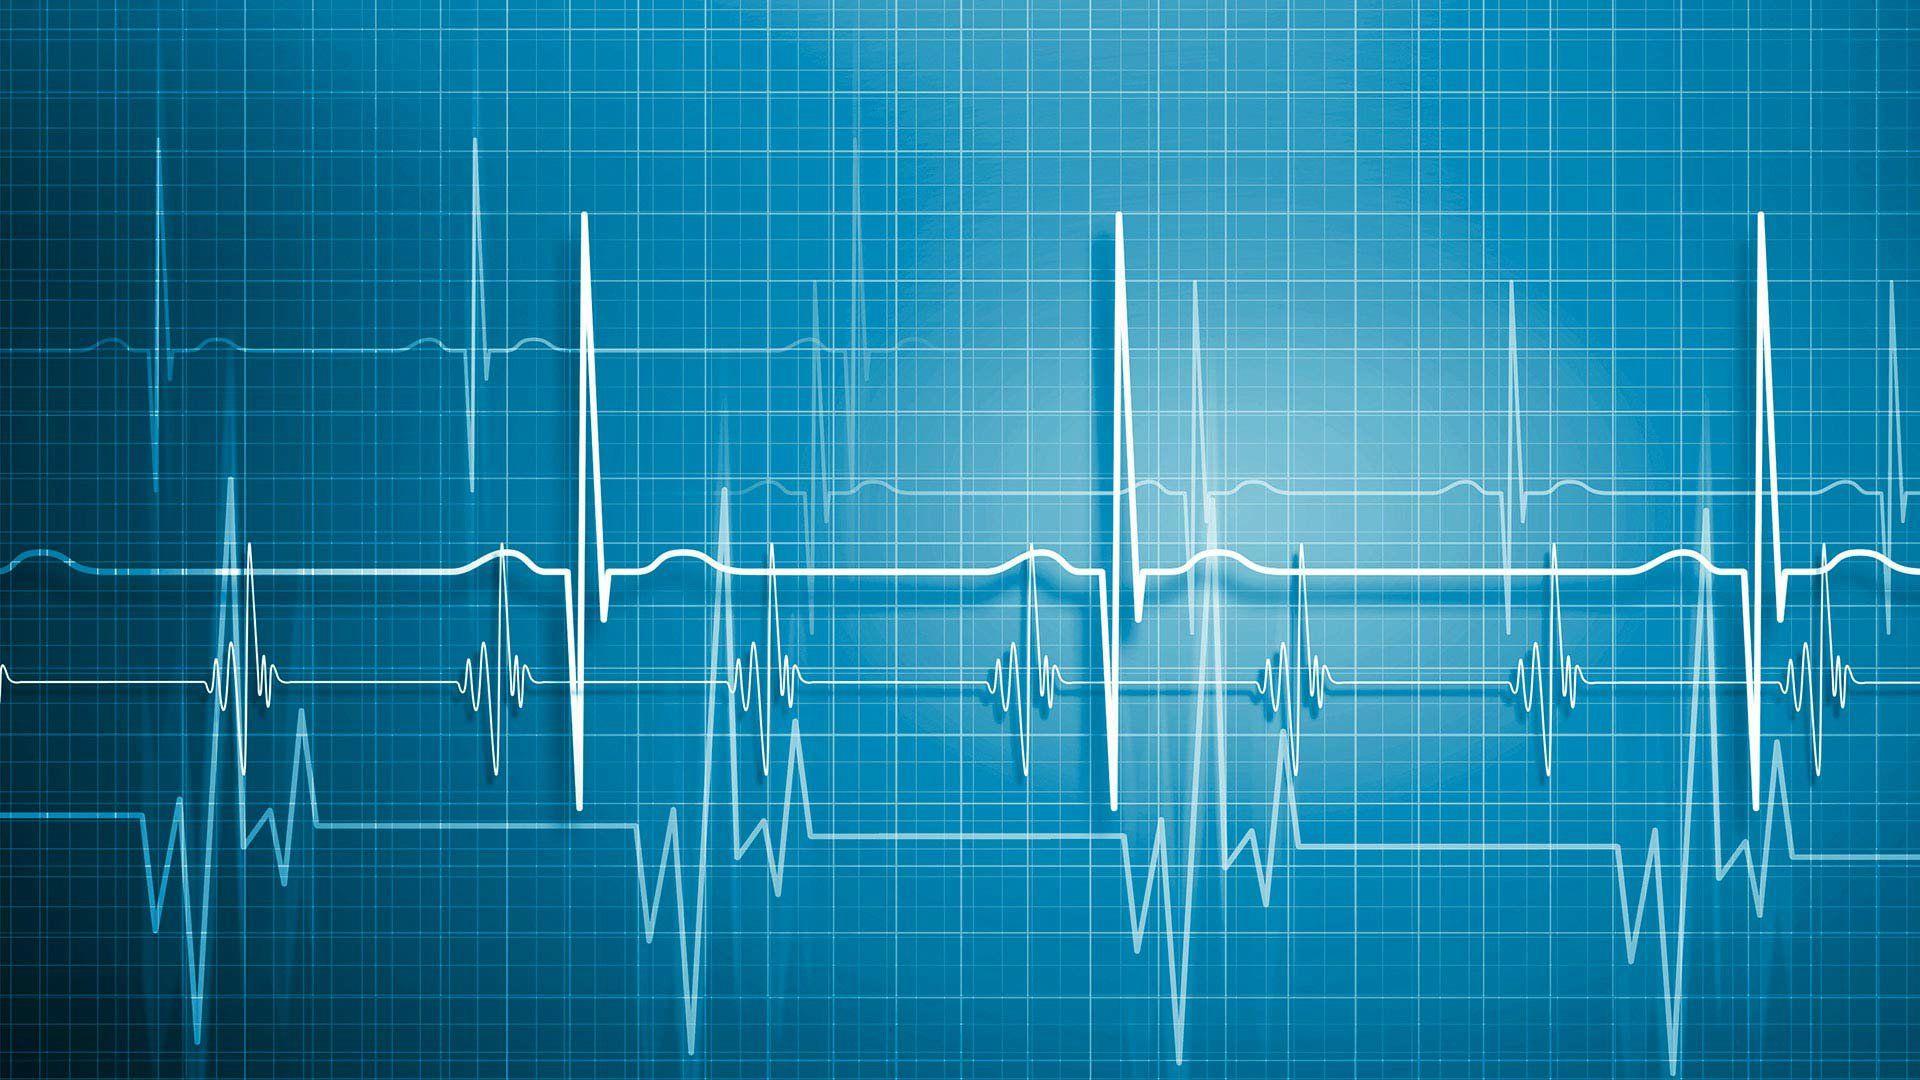 medical-technology-wallpaper-medical